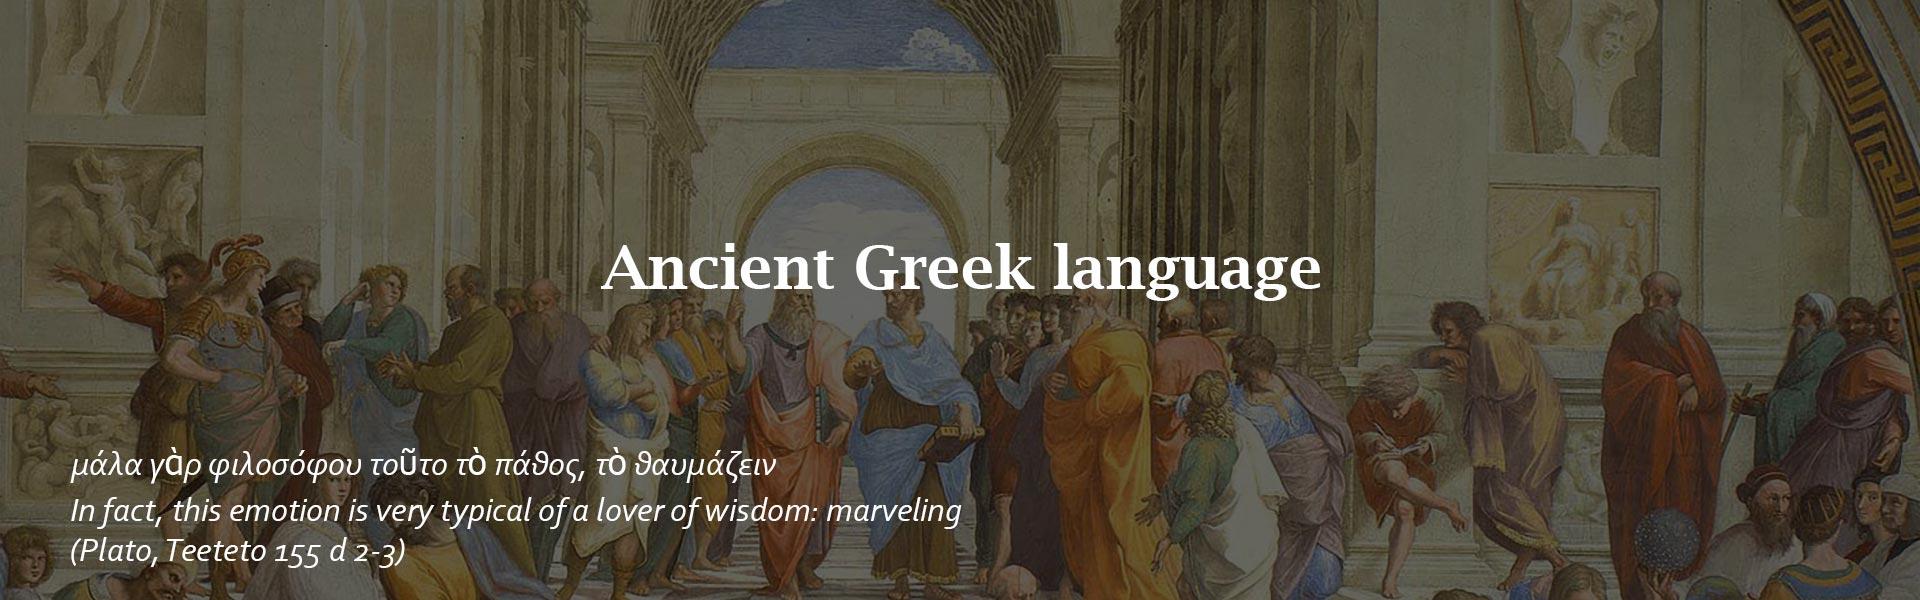 Ancient-Greek-language-alif